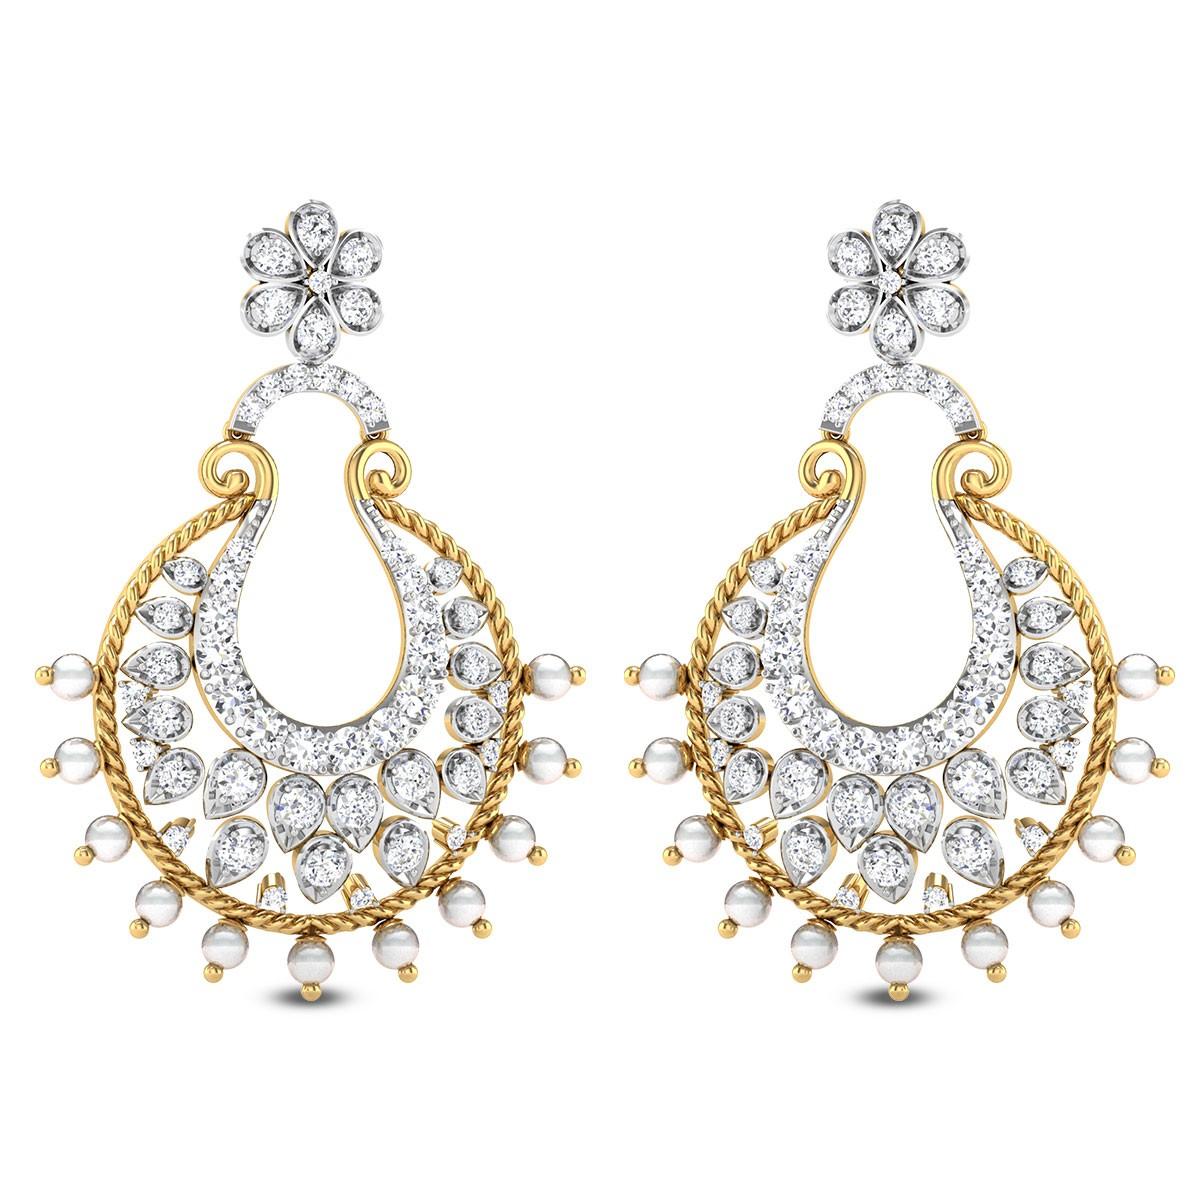 Trachelium Diamond Earrings